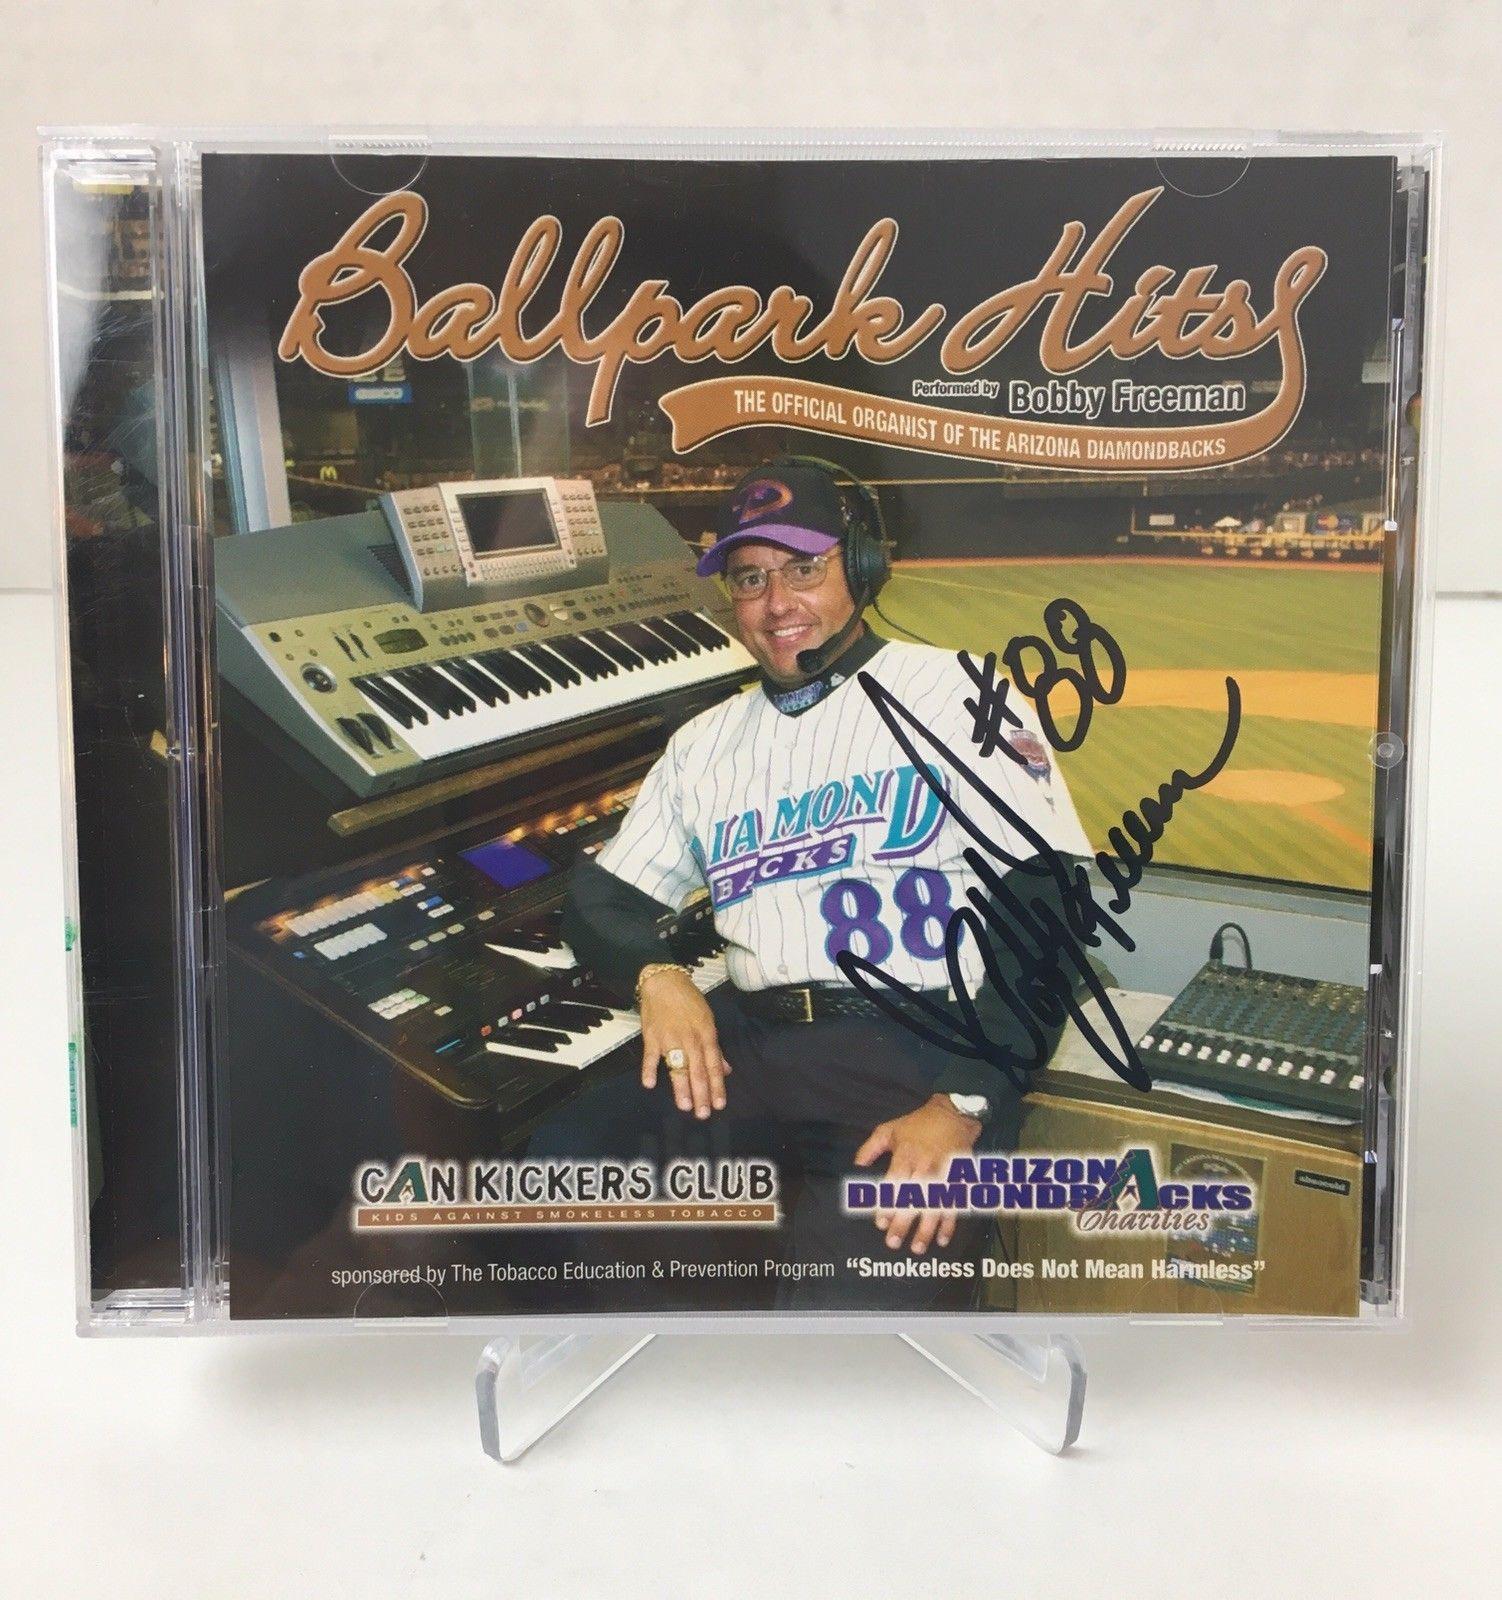 Ballpark Hits by Bobby Freeman Official Organist of Arizona Diamondbacks Signed